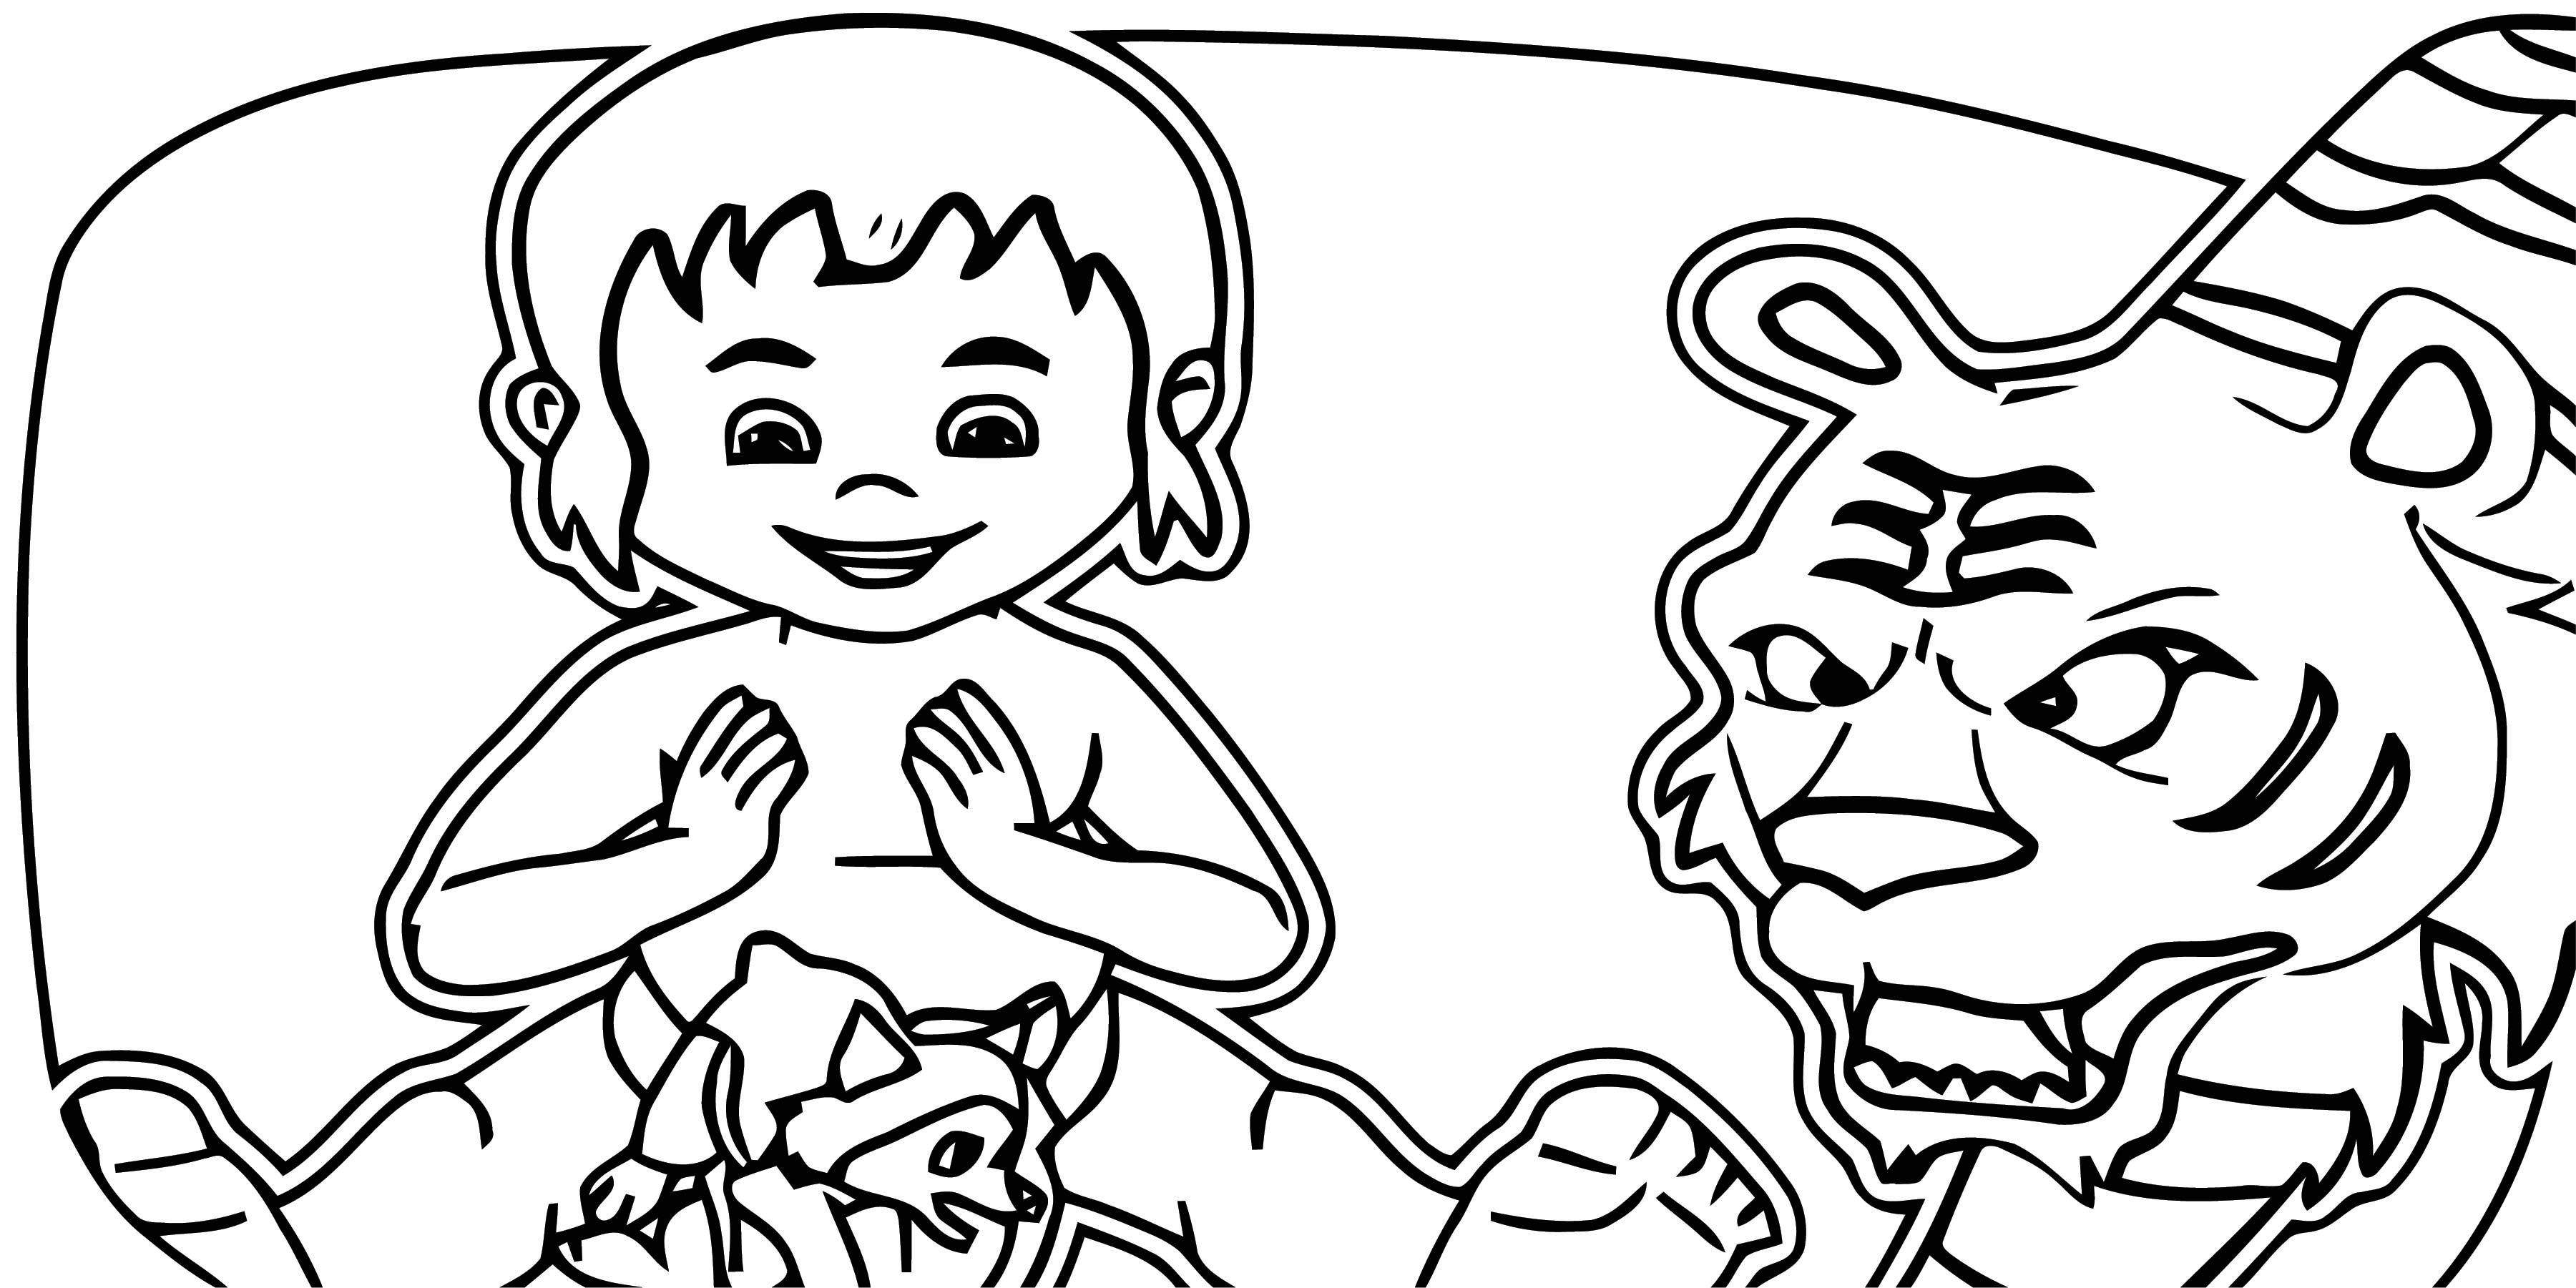 Disney Jungle Book Coloring Page 58